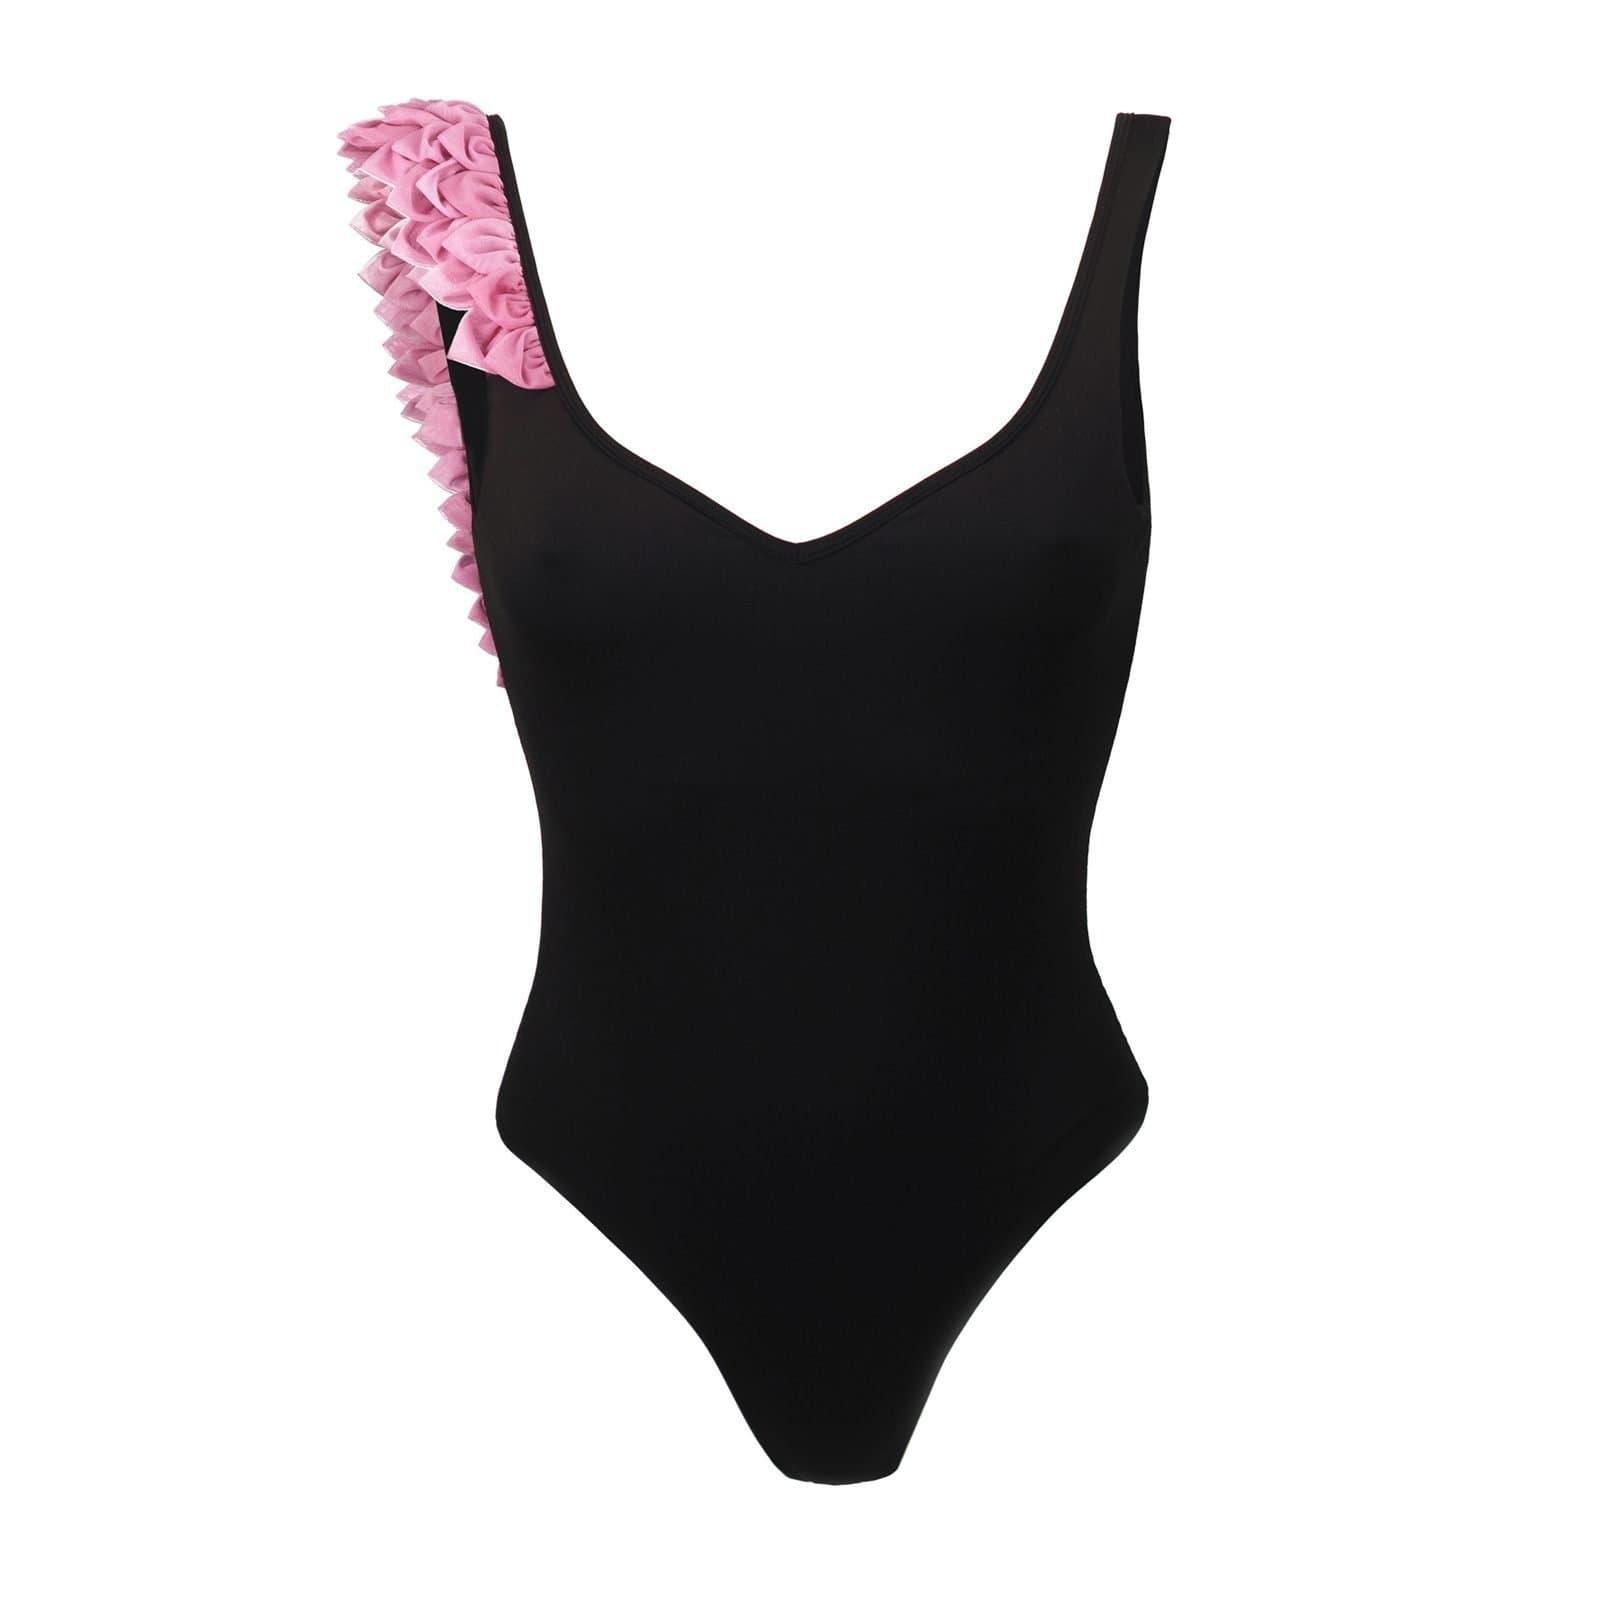 0cb133457 In Bloom black one piece with pink 3D petals - Kinda 3D swimwear